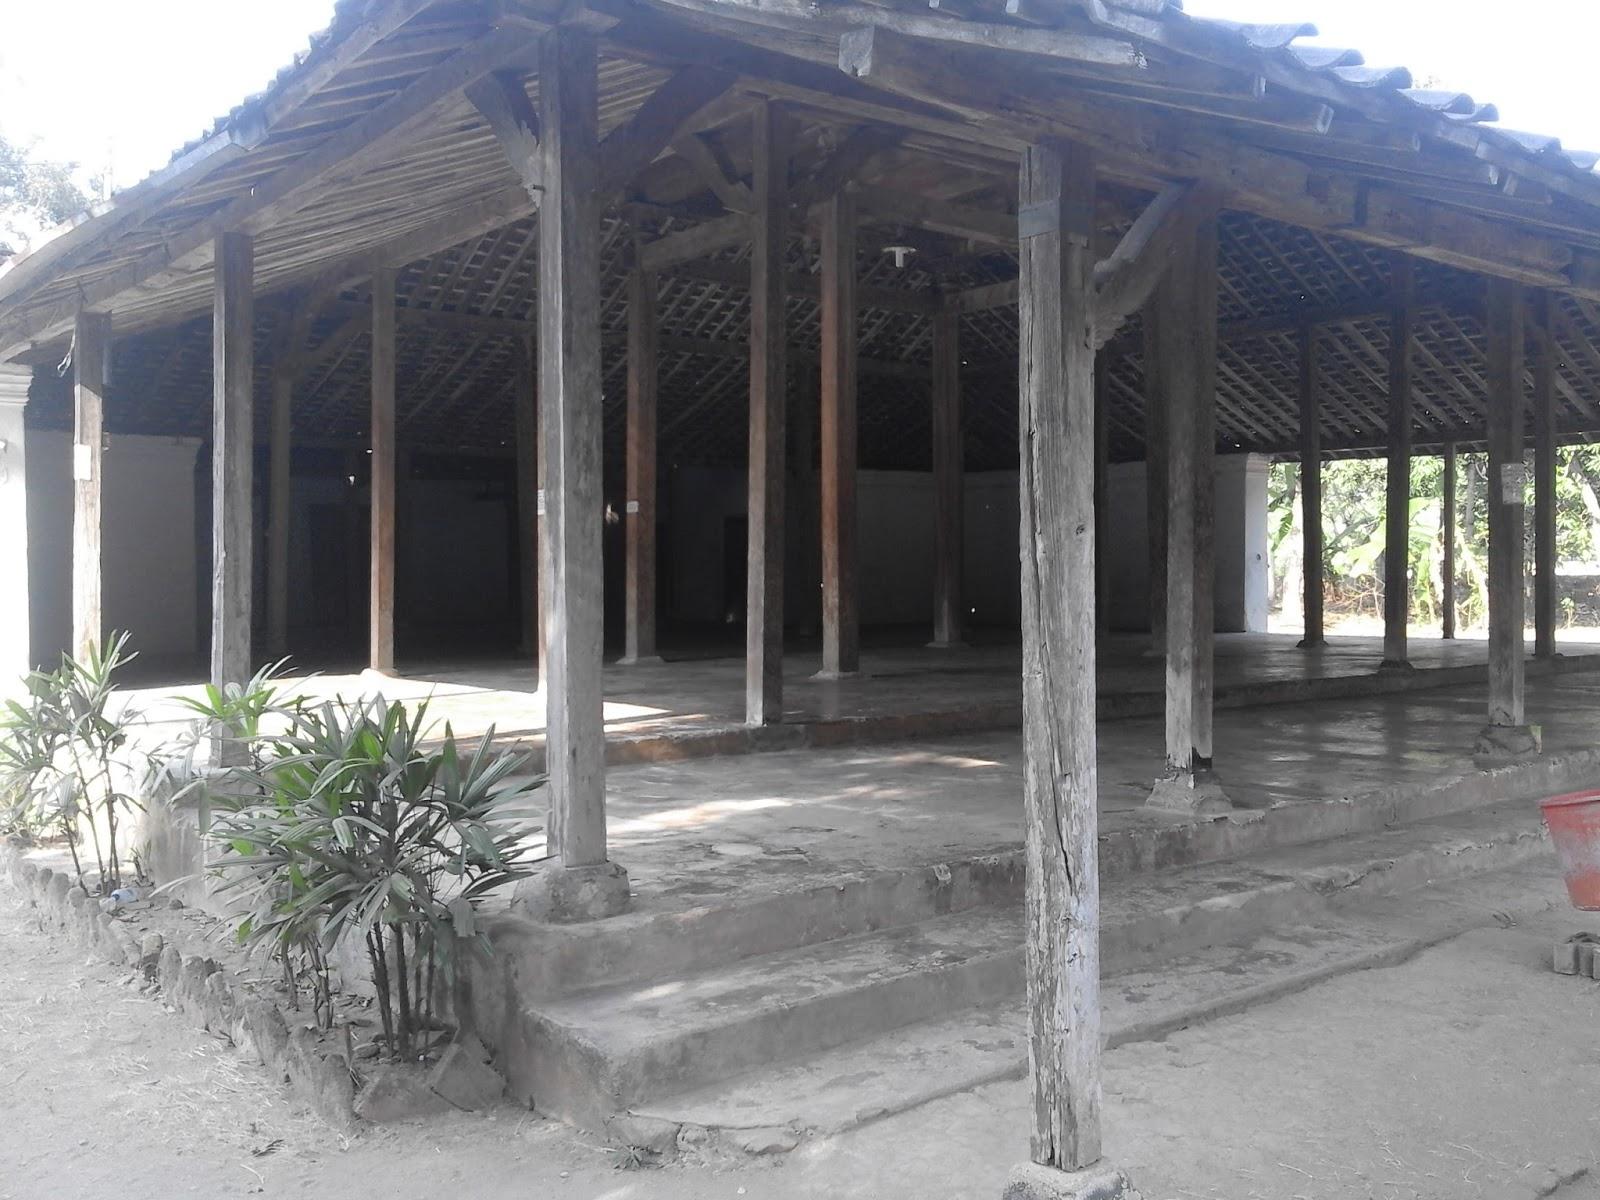 Bhuvana Masjid Tegalsari Kab Ponorogo